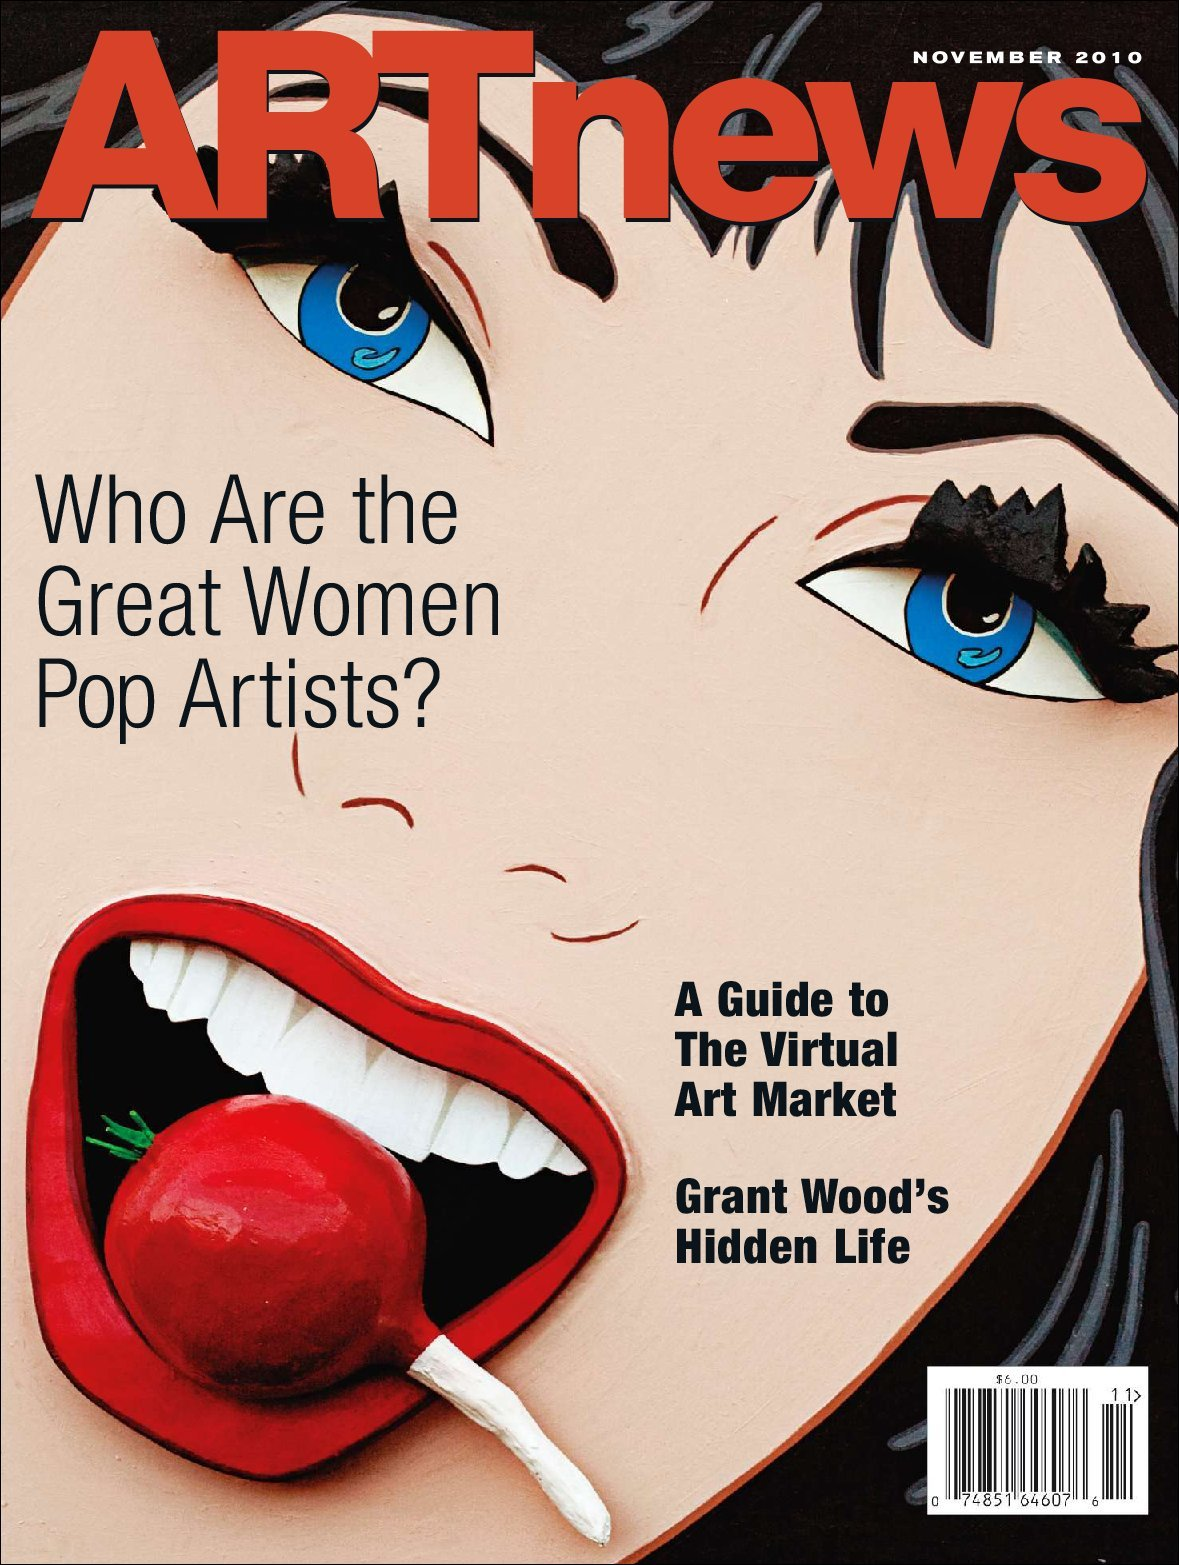 ARTnews November 2010 Express Issue Digital